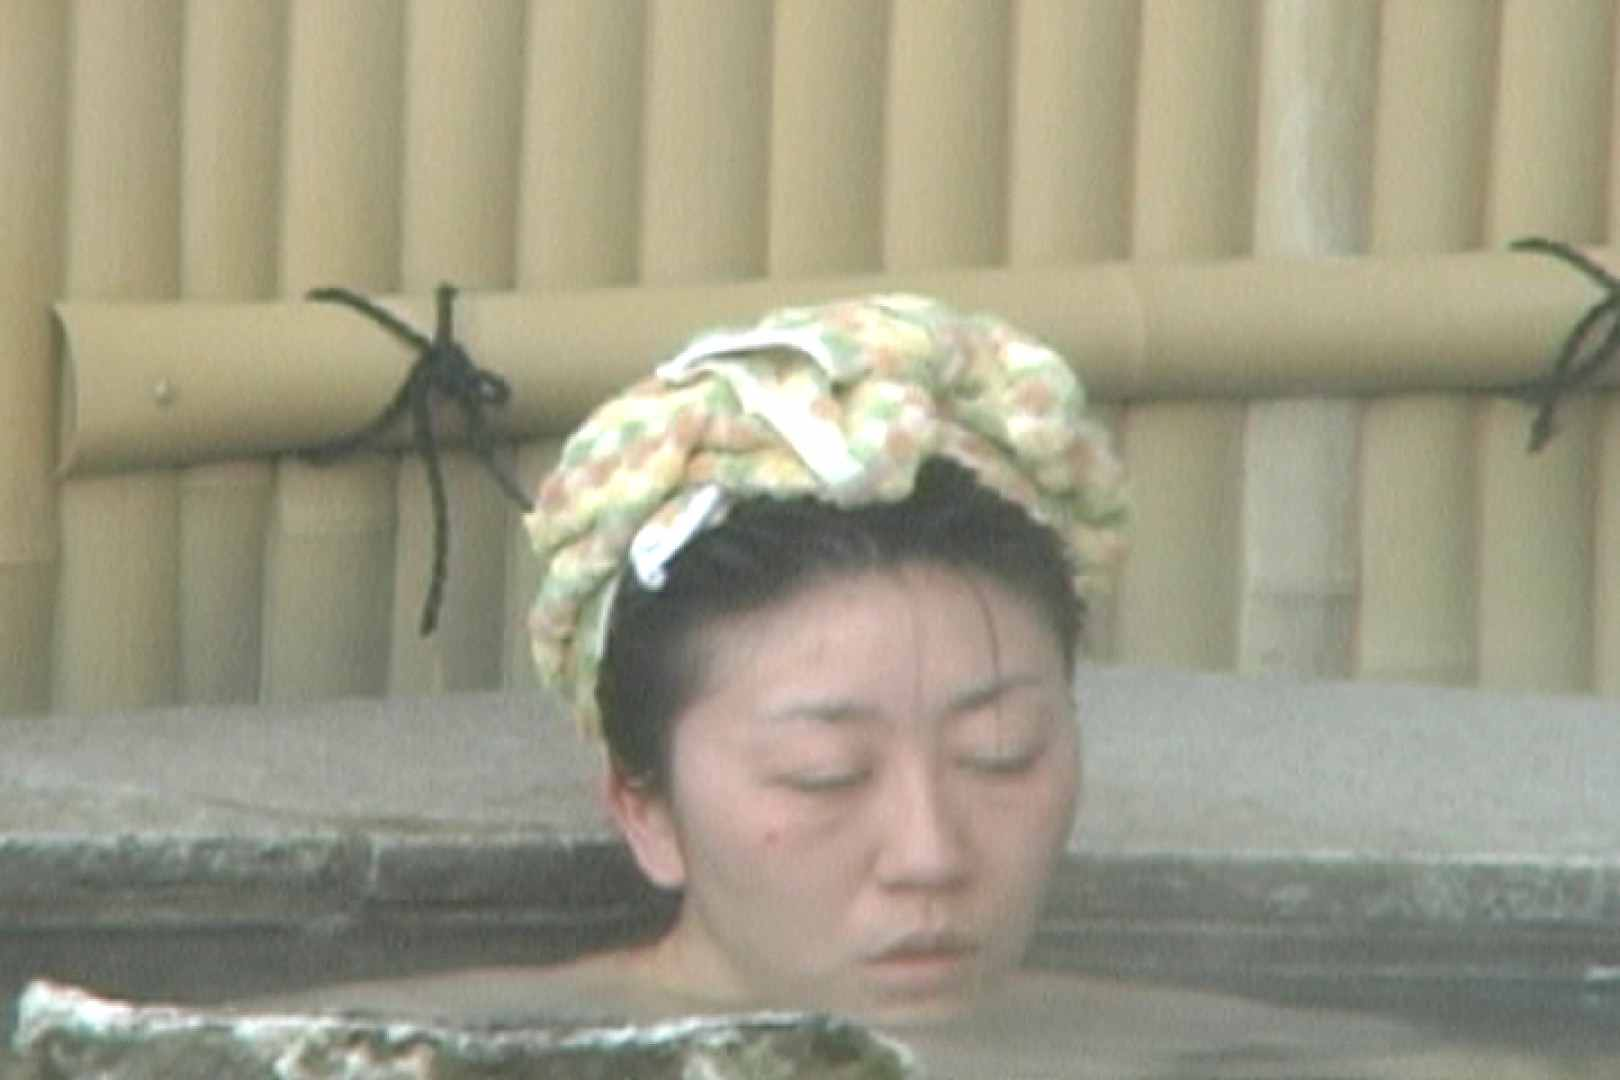 Aquaな露天風呂Vol.594 露天 | OLのプライベート  10pic 7